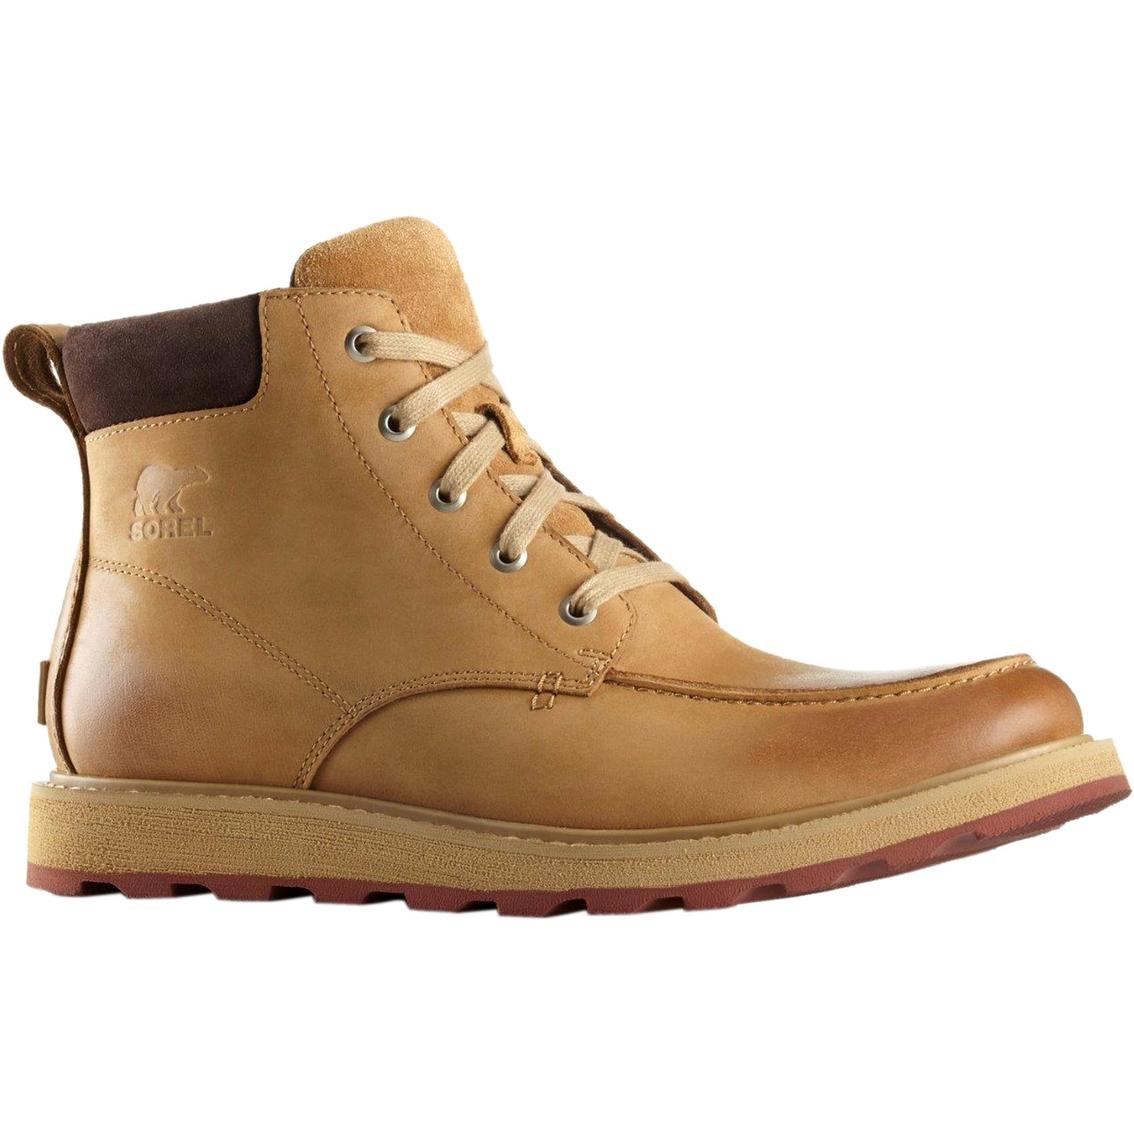 ecd80f20666 Sorel Madson Moc Toe Men s Boots